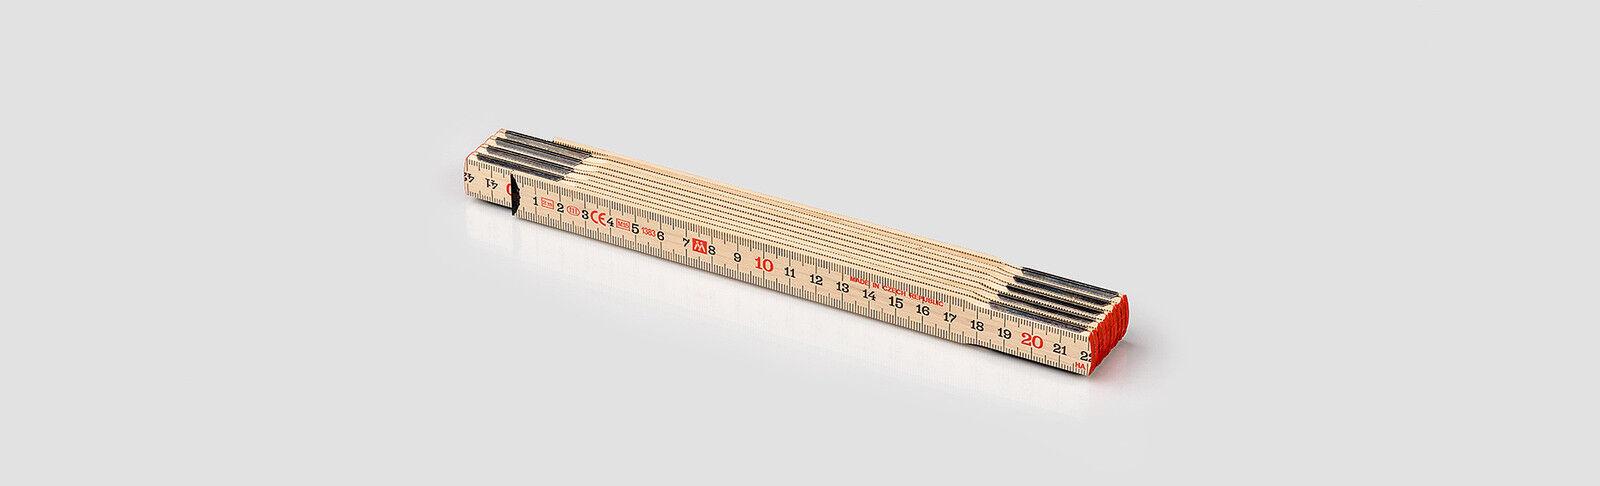 Metrie Holzwaren